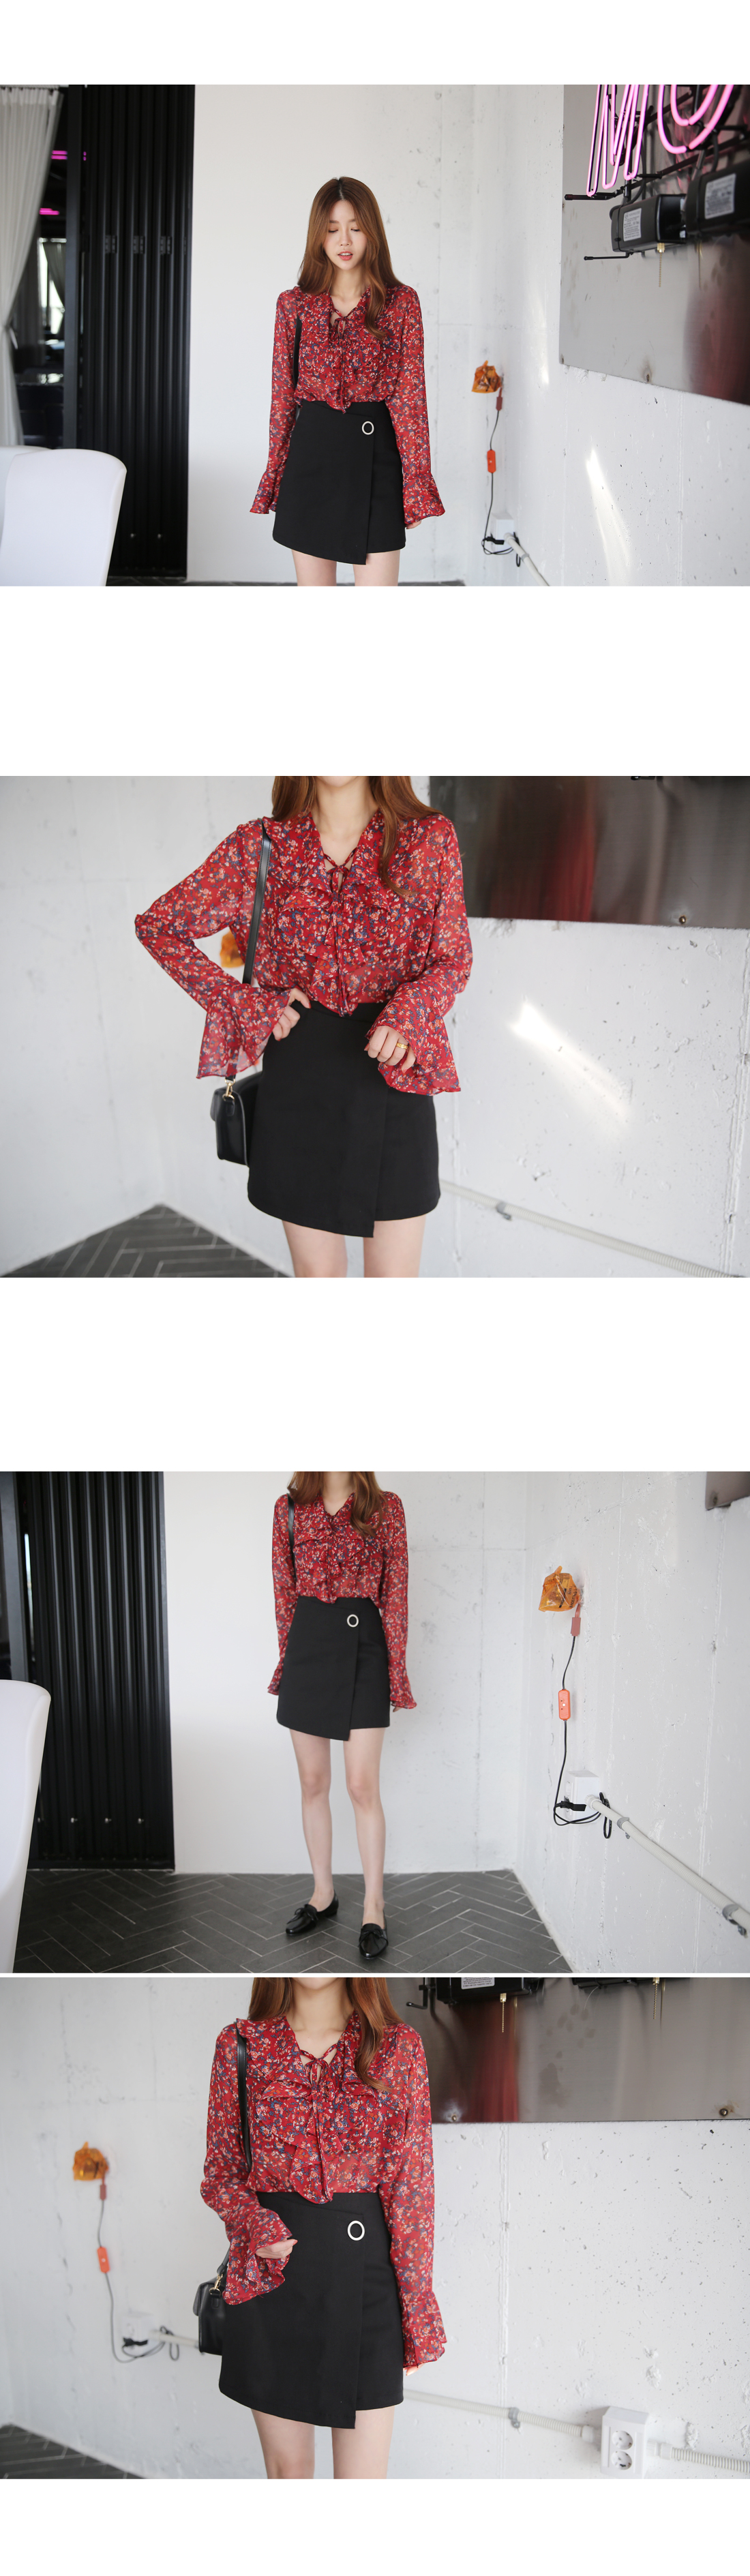 Raleigh skirt